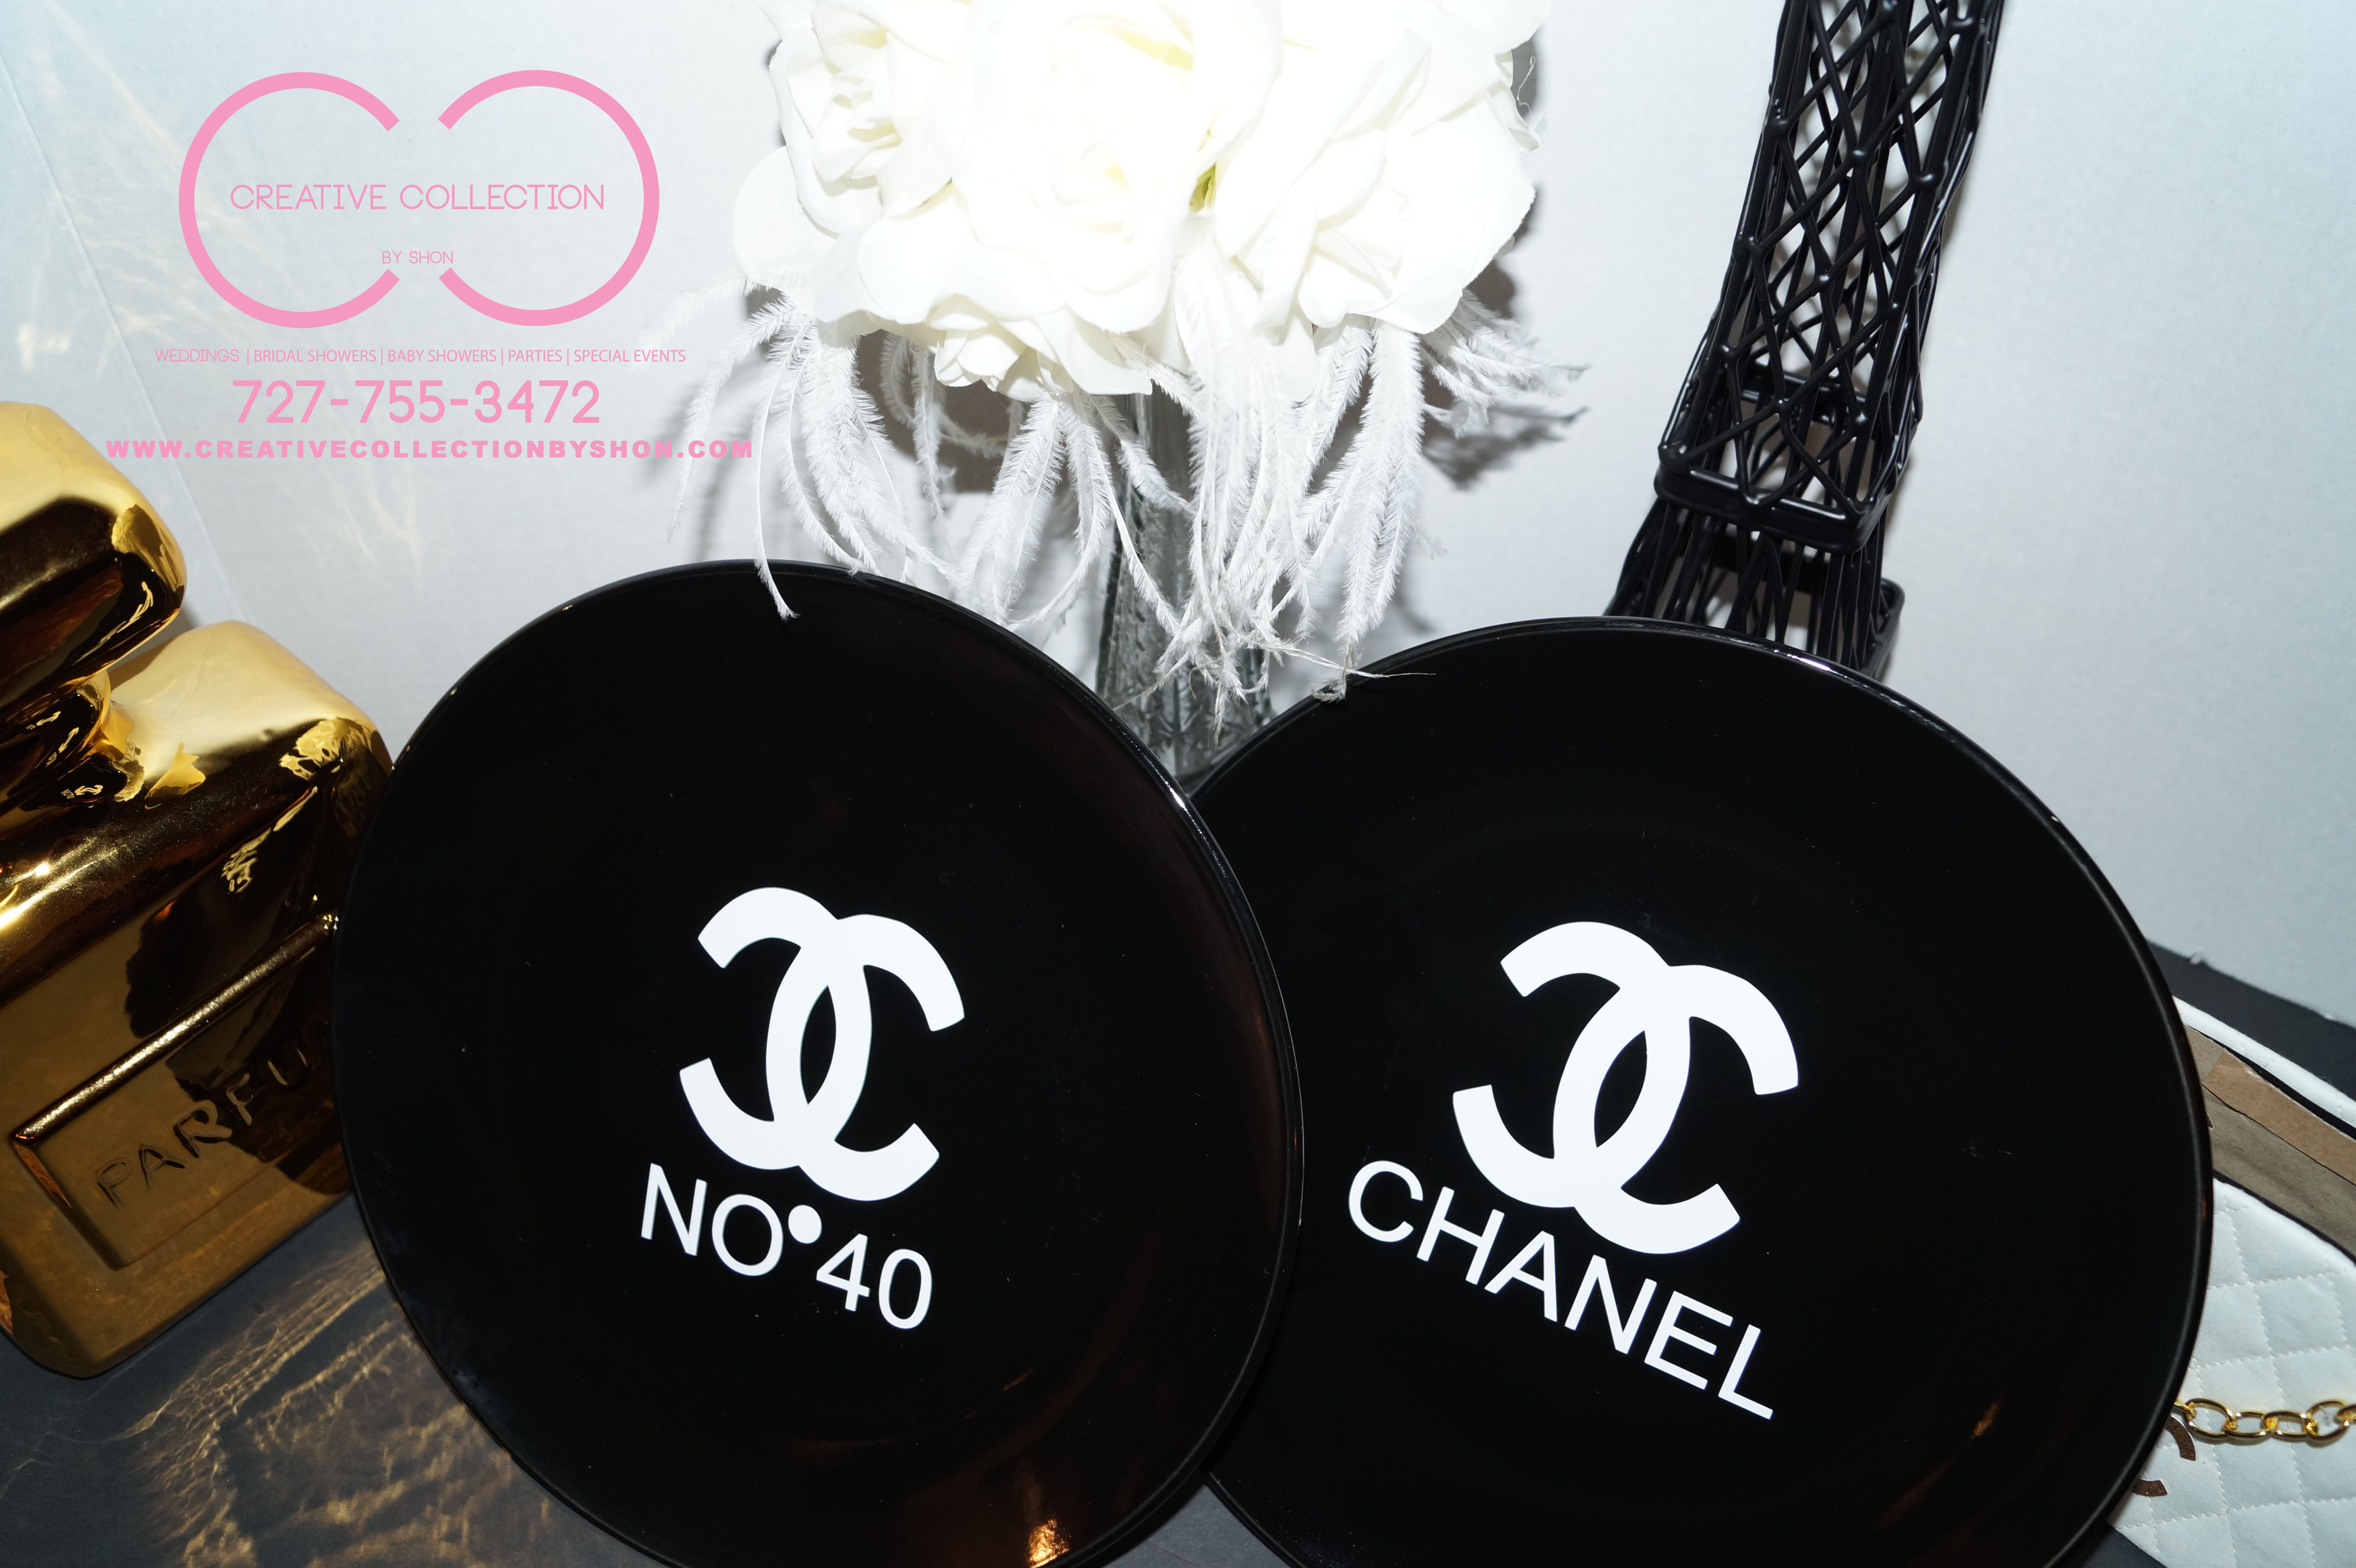 Chanel Plates